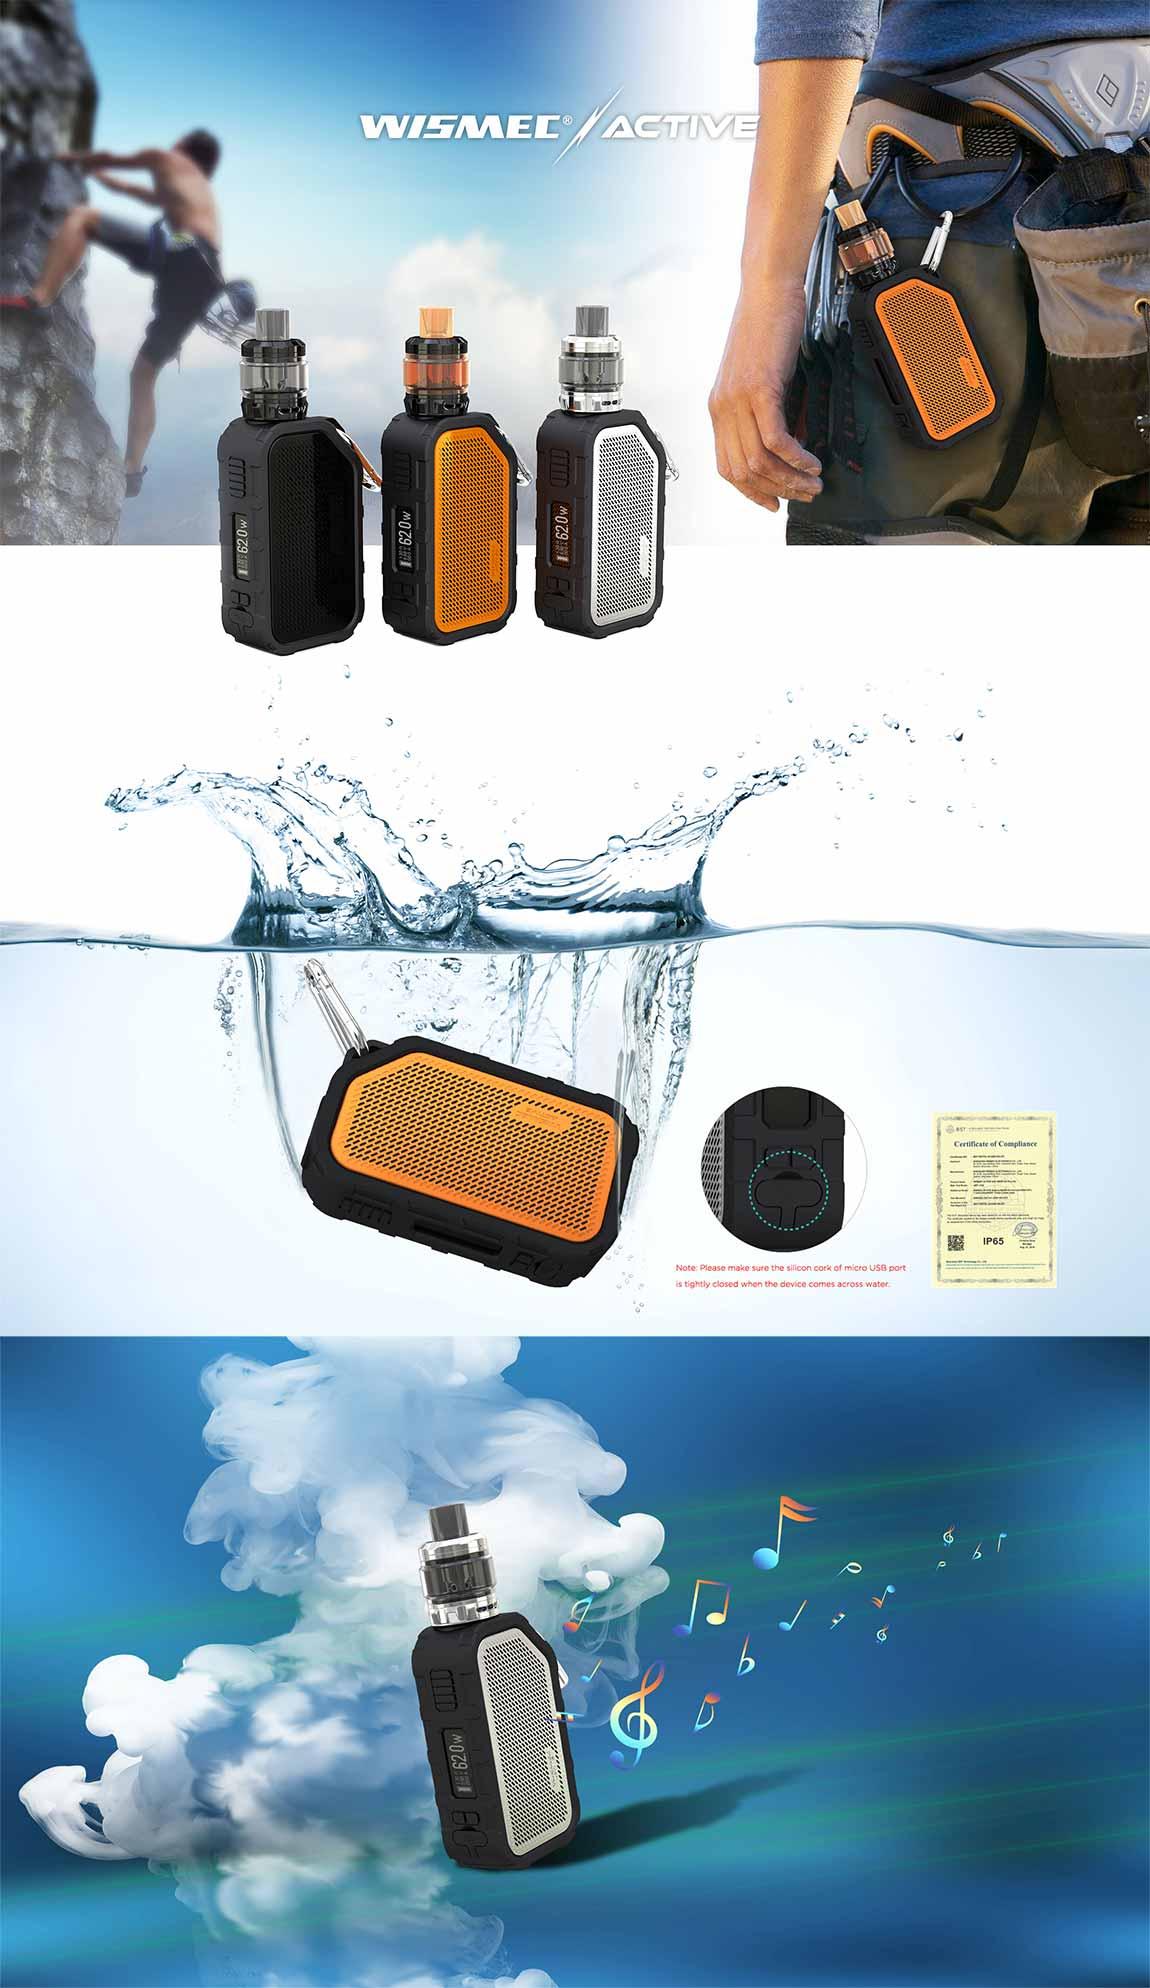 Wismec Active kit - características